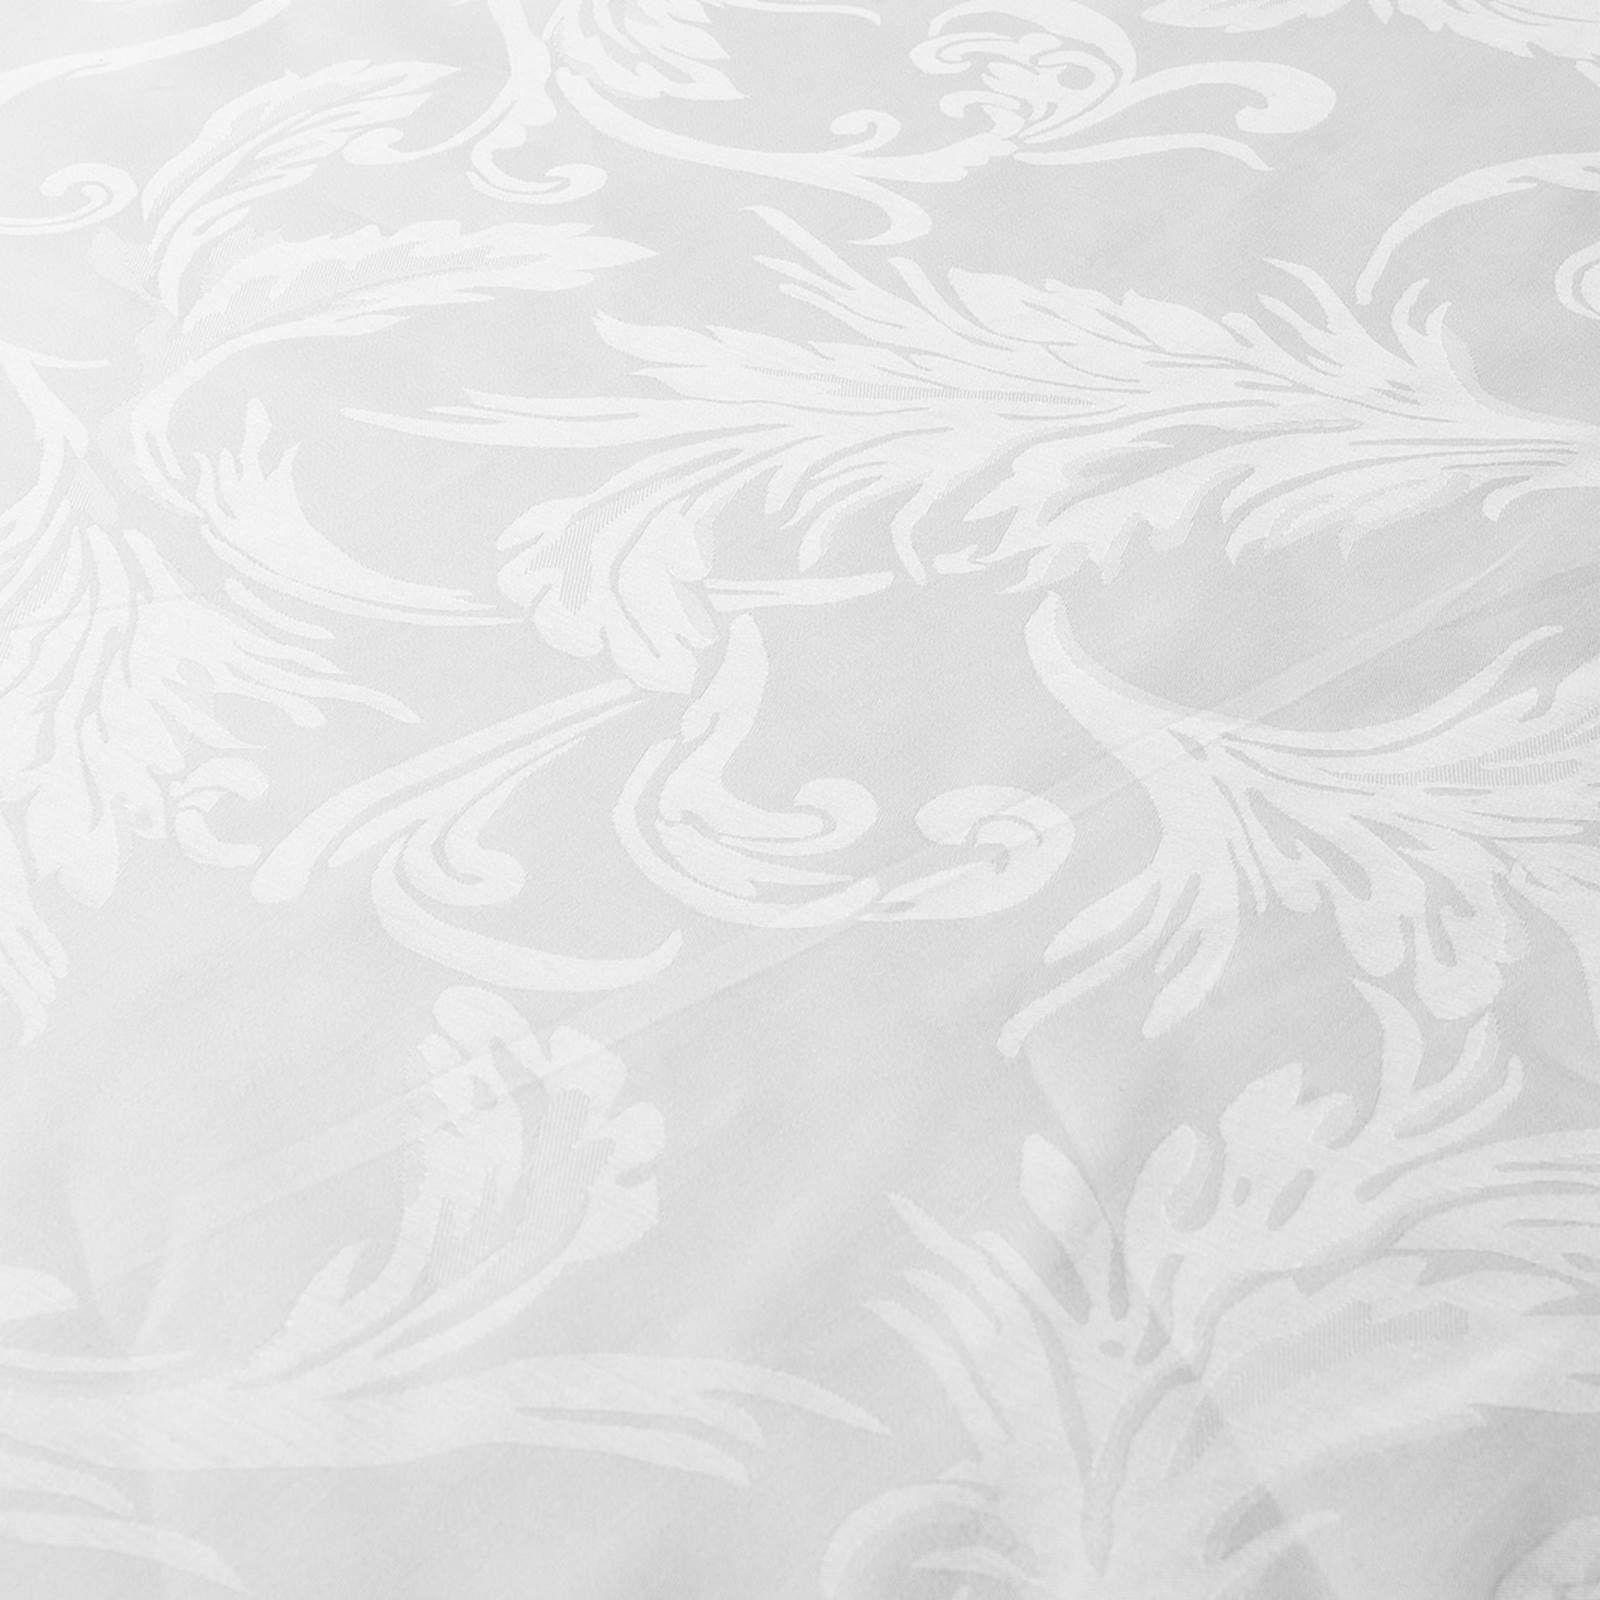 sissi baumwoll damast von aktivstoffe jacquard stoff seidenglanz dessins stoffe n hen diy. Black Bedroom Furniture Sets. Home Design Ideas